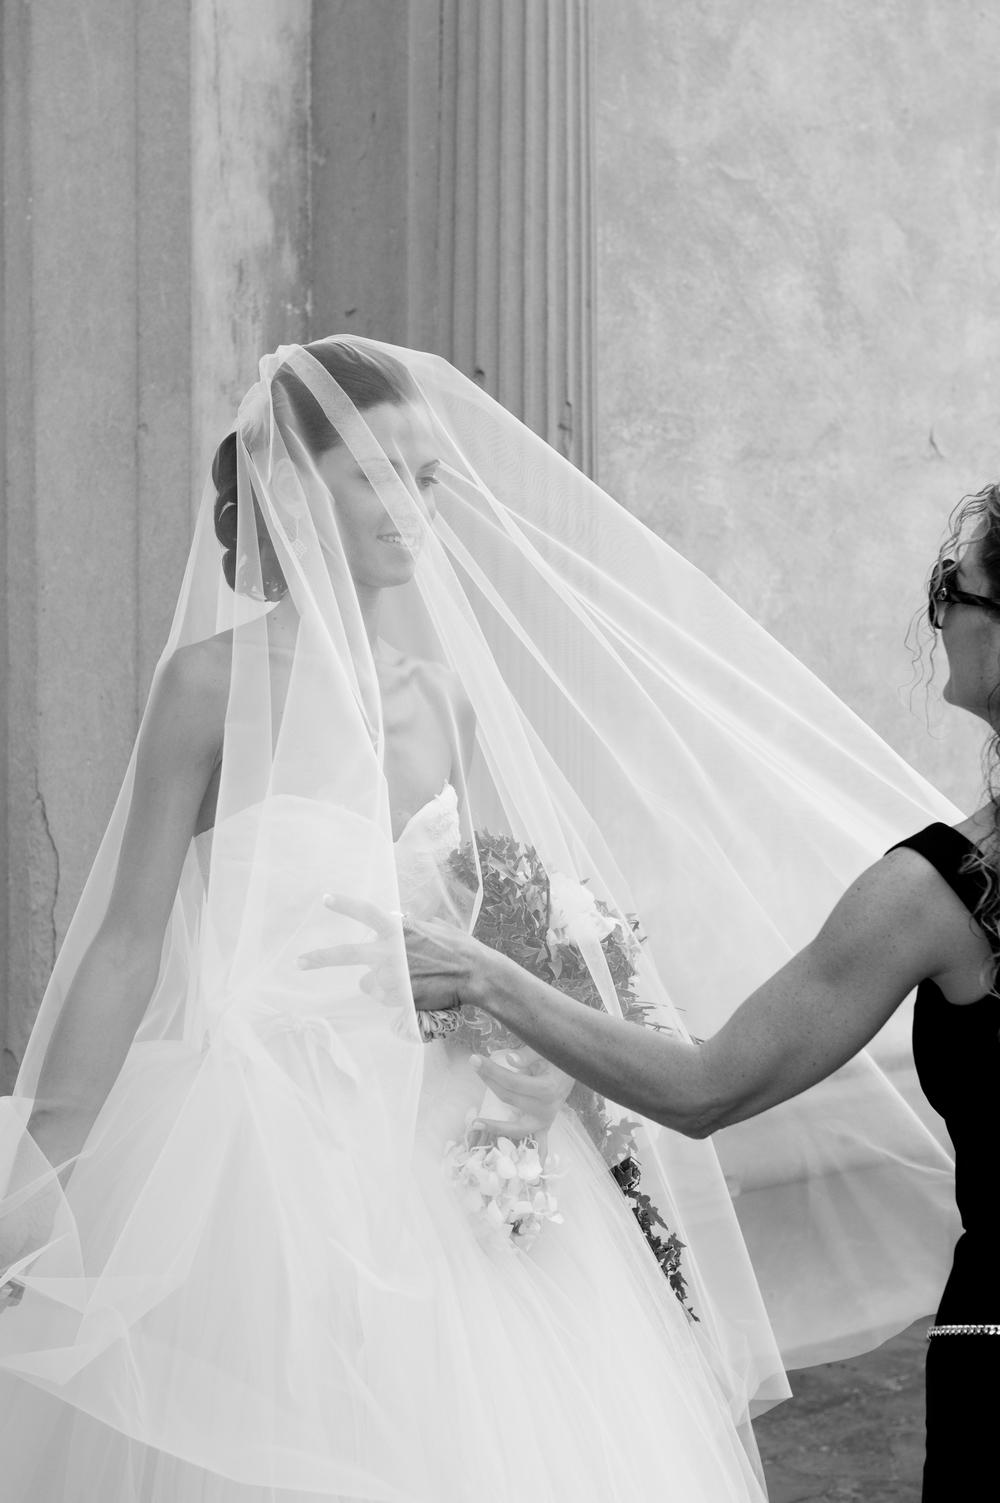 Foto_Bettina_Conradi_Hochzeit21.jpg